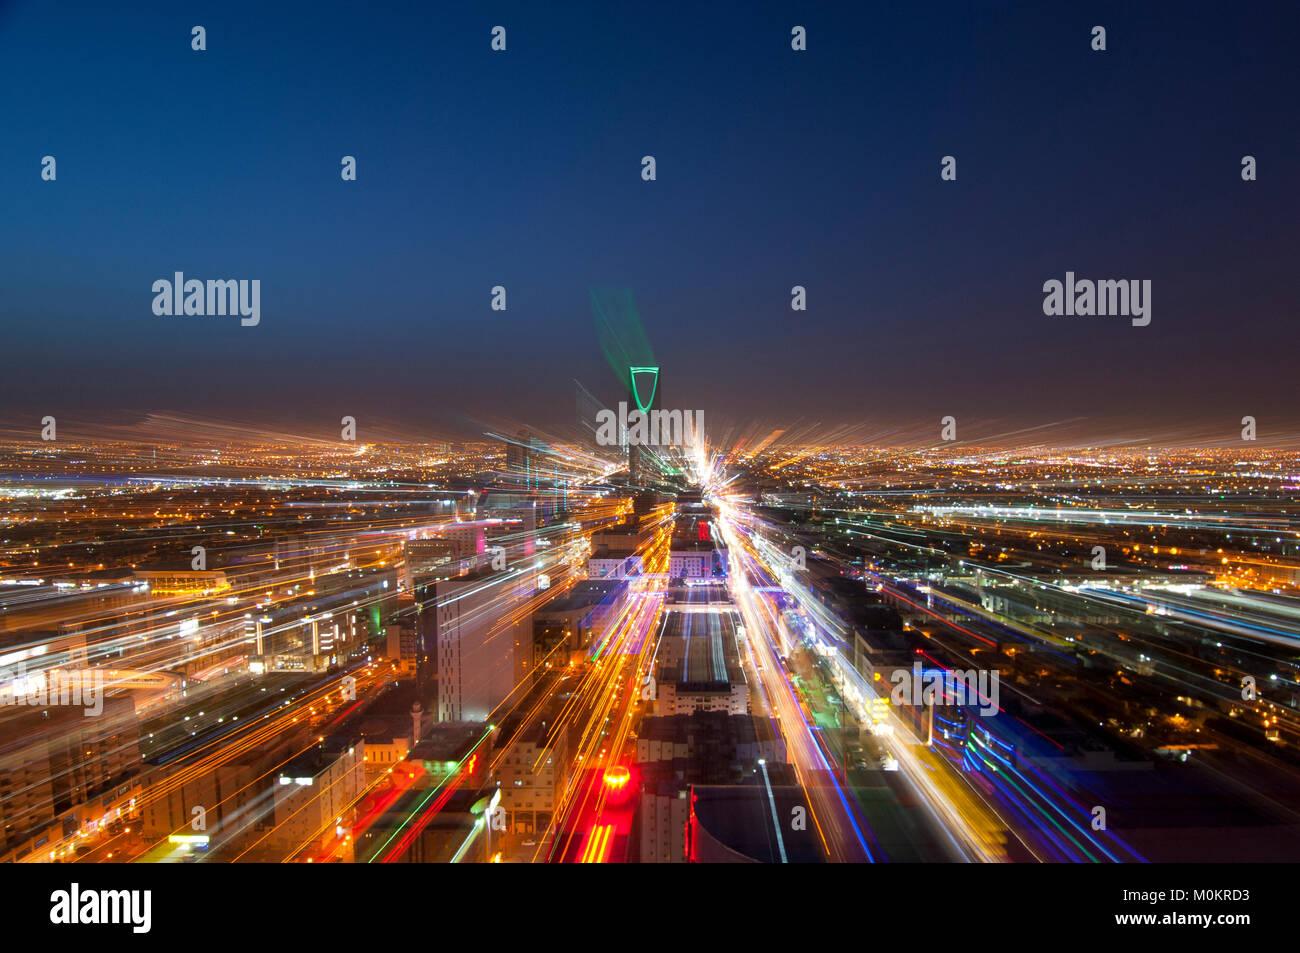 Riyadh skyline at night #4 - Stock Image